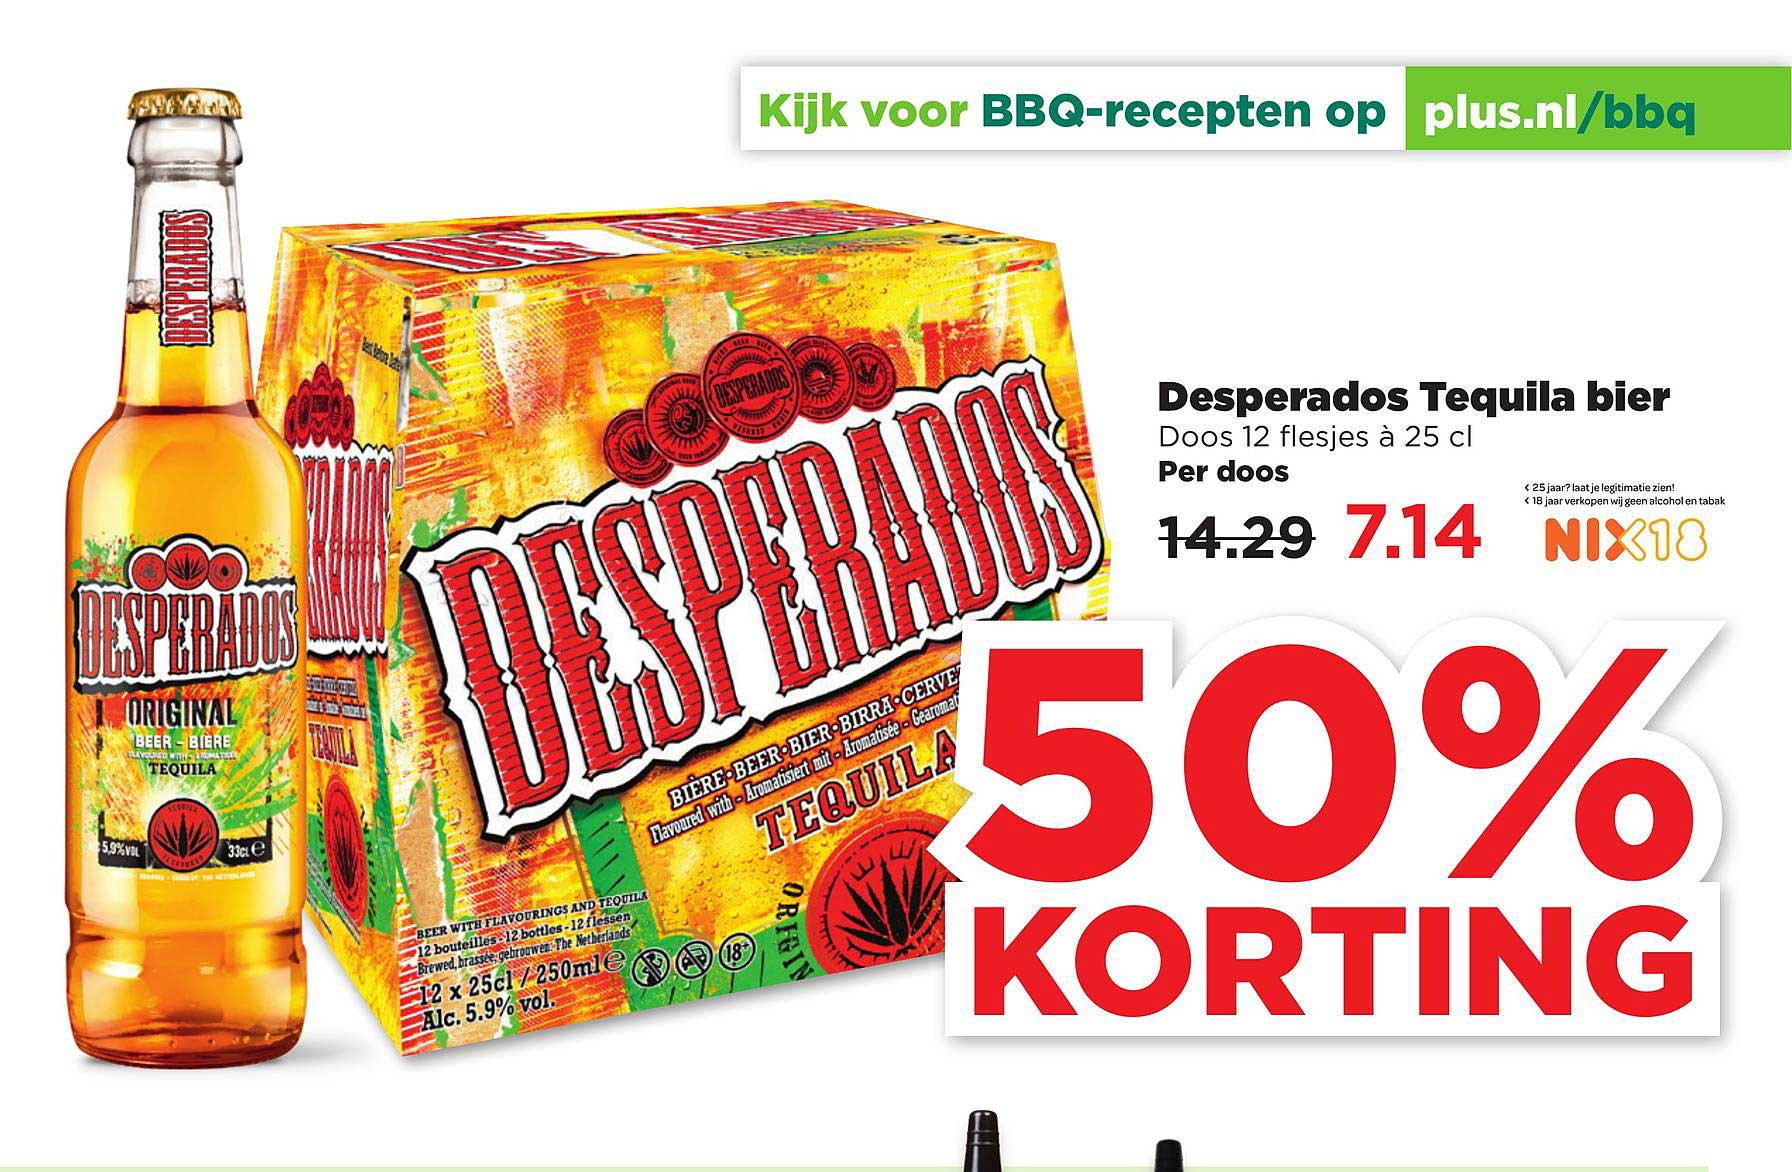 PLUS Desperados Tequila Bier 50% Korting